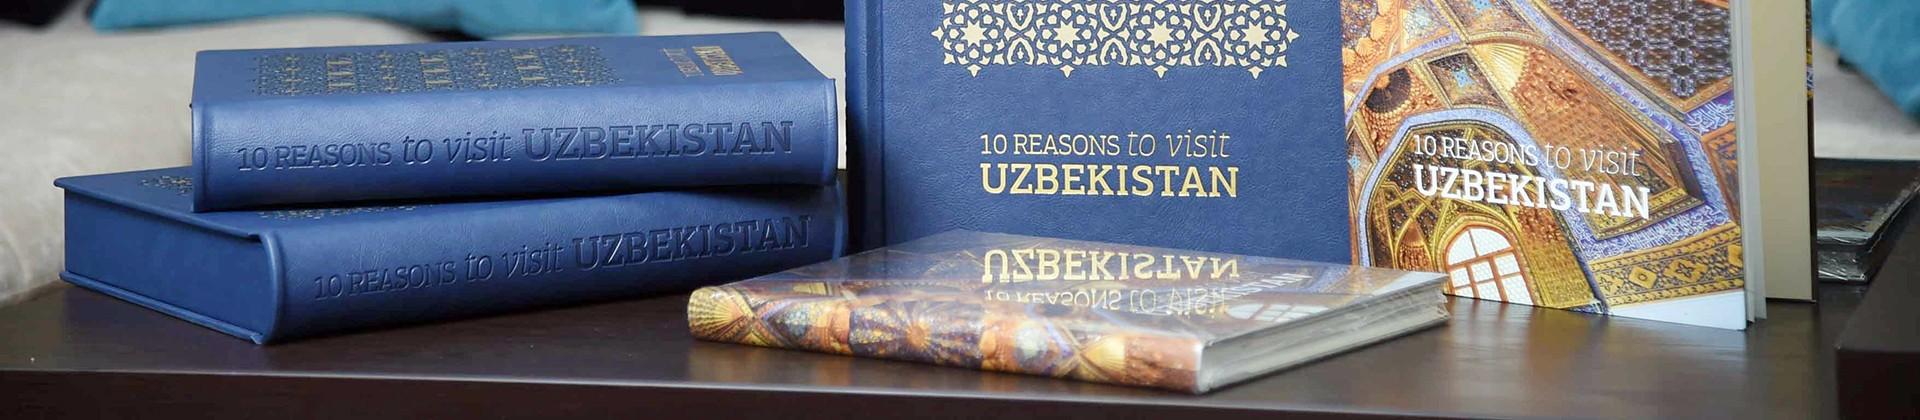 Books about Uzbekistan - 1